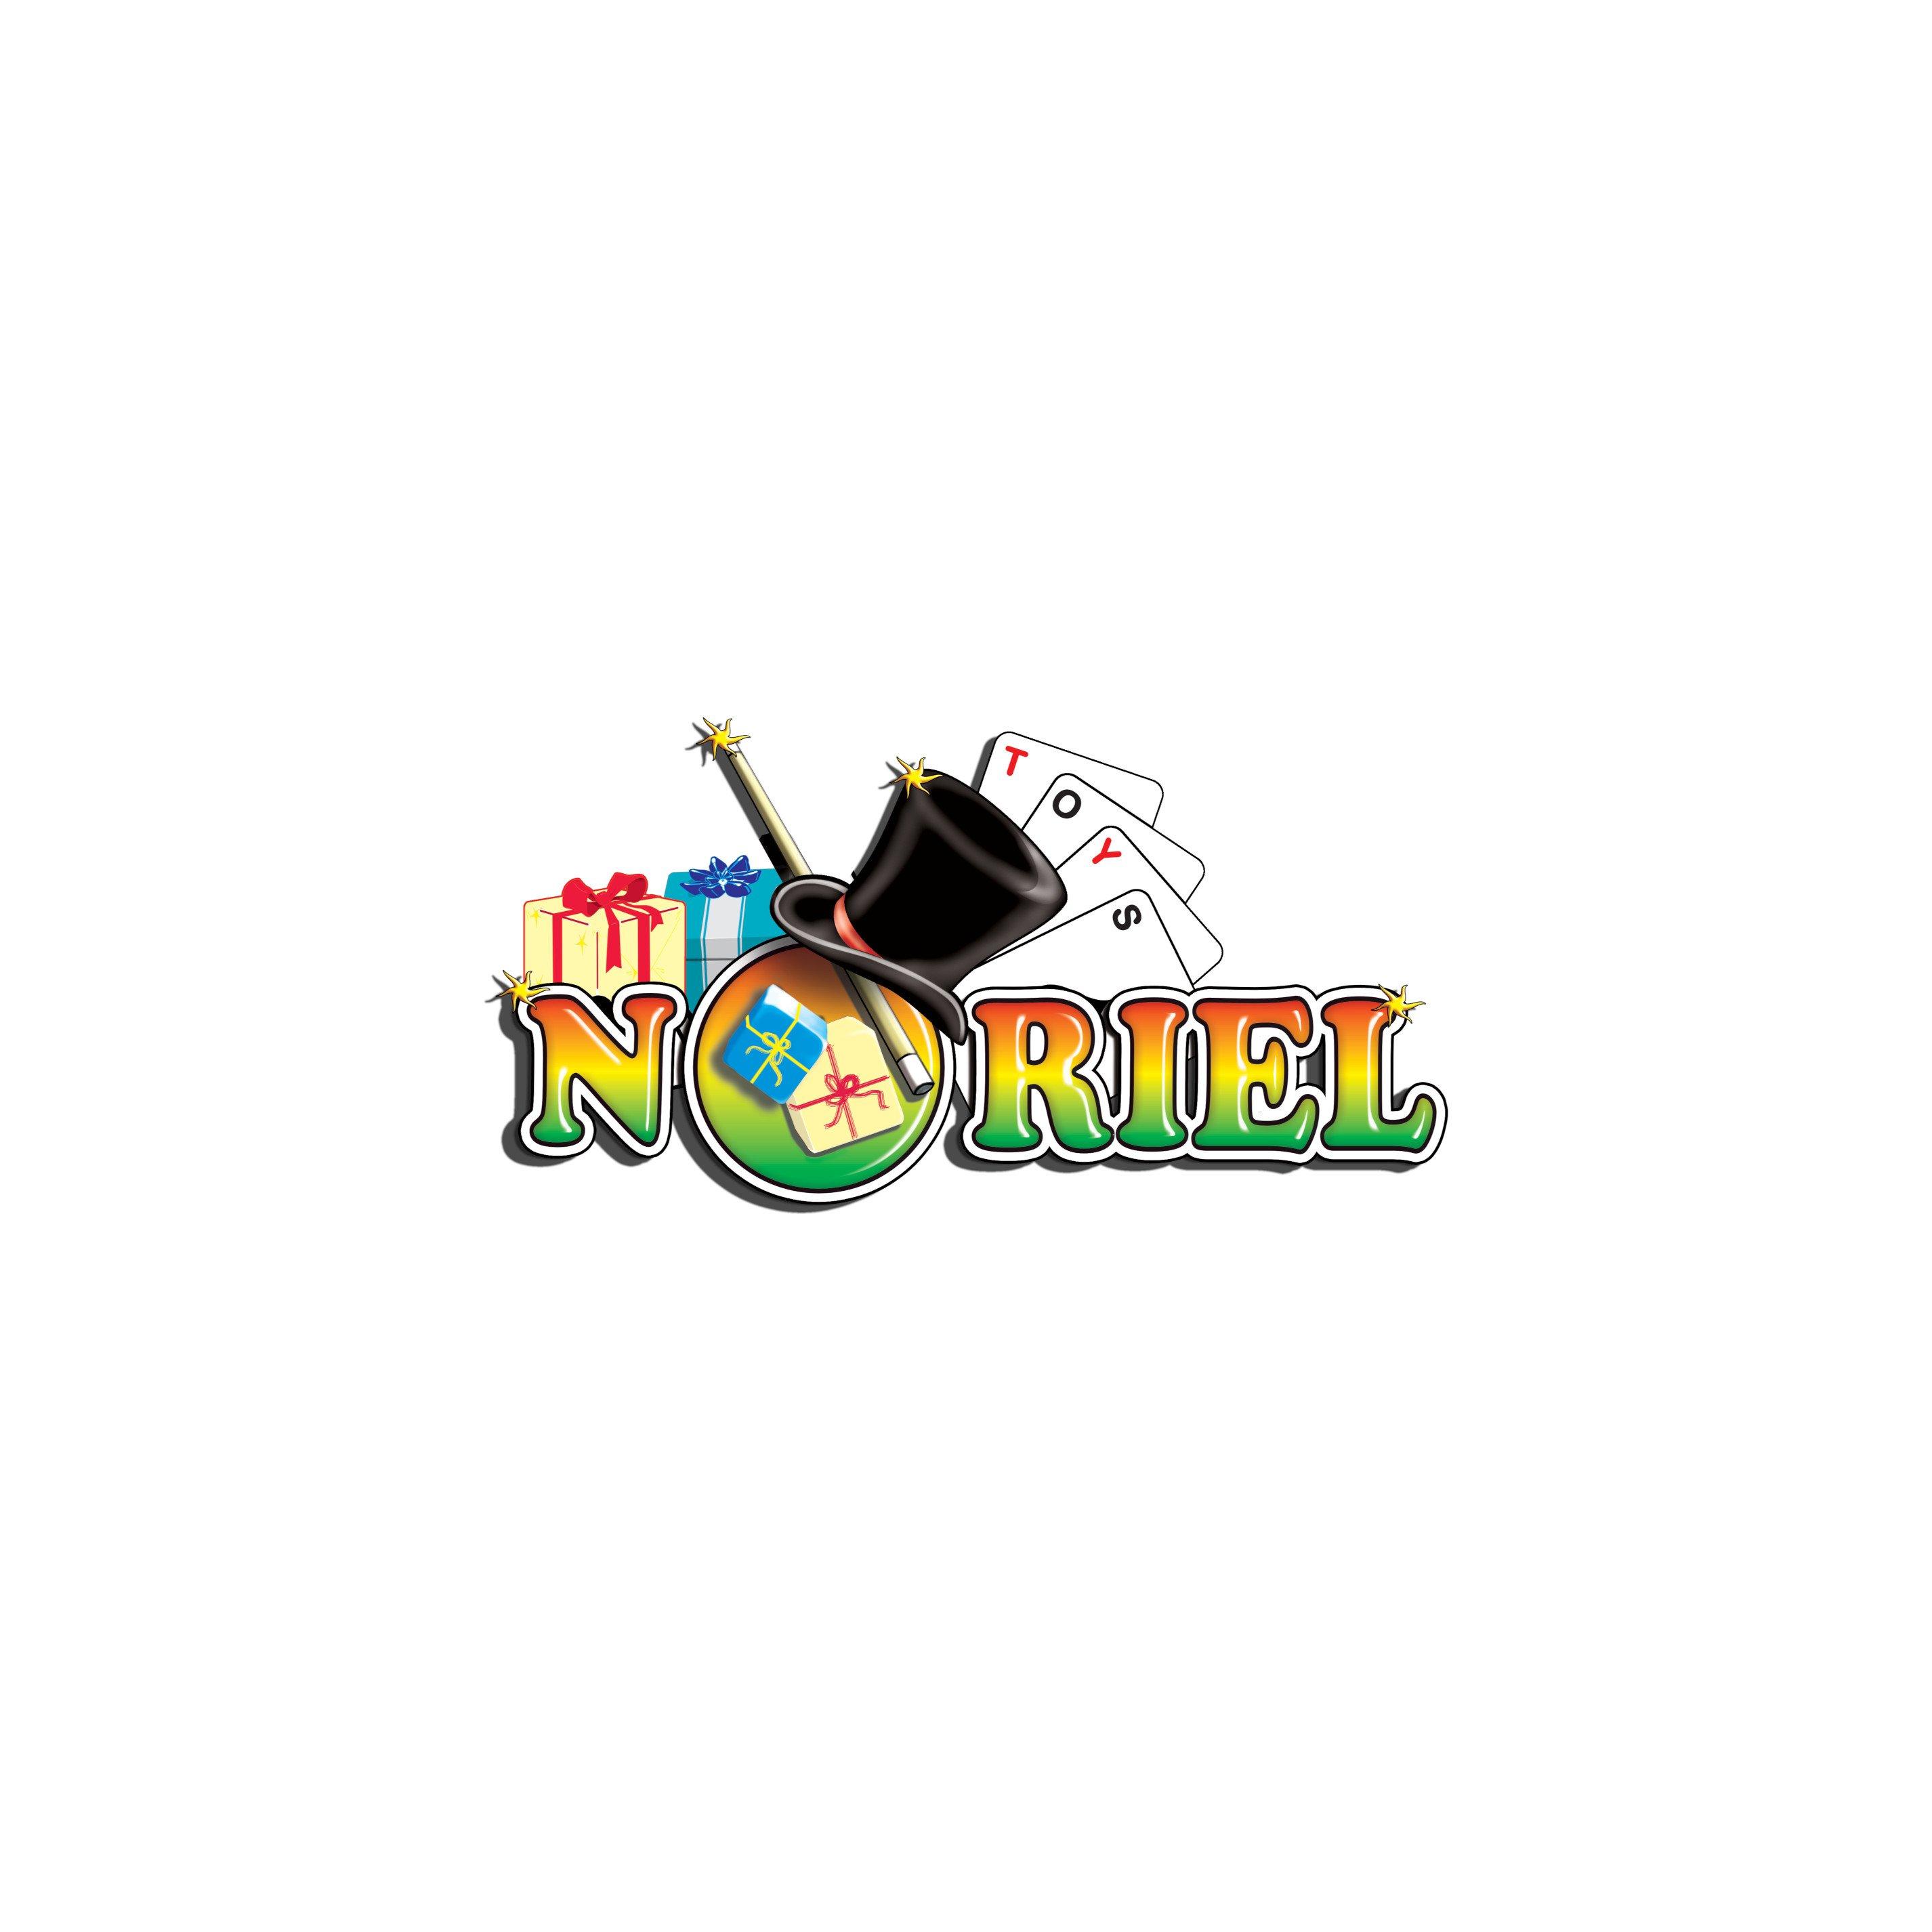 M318X014_1-3Y_001 Caciula tricotata cu mot si dungi Minoti Hat